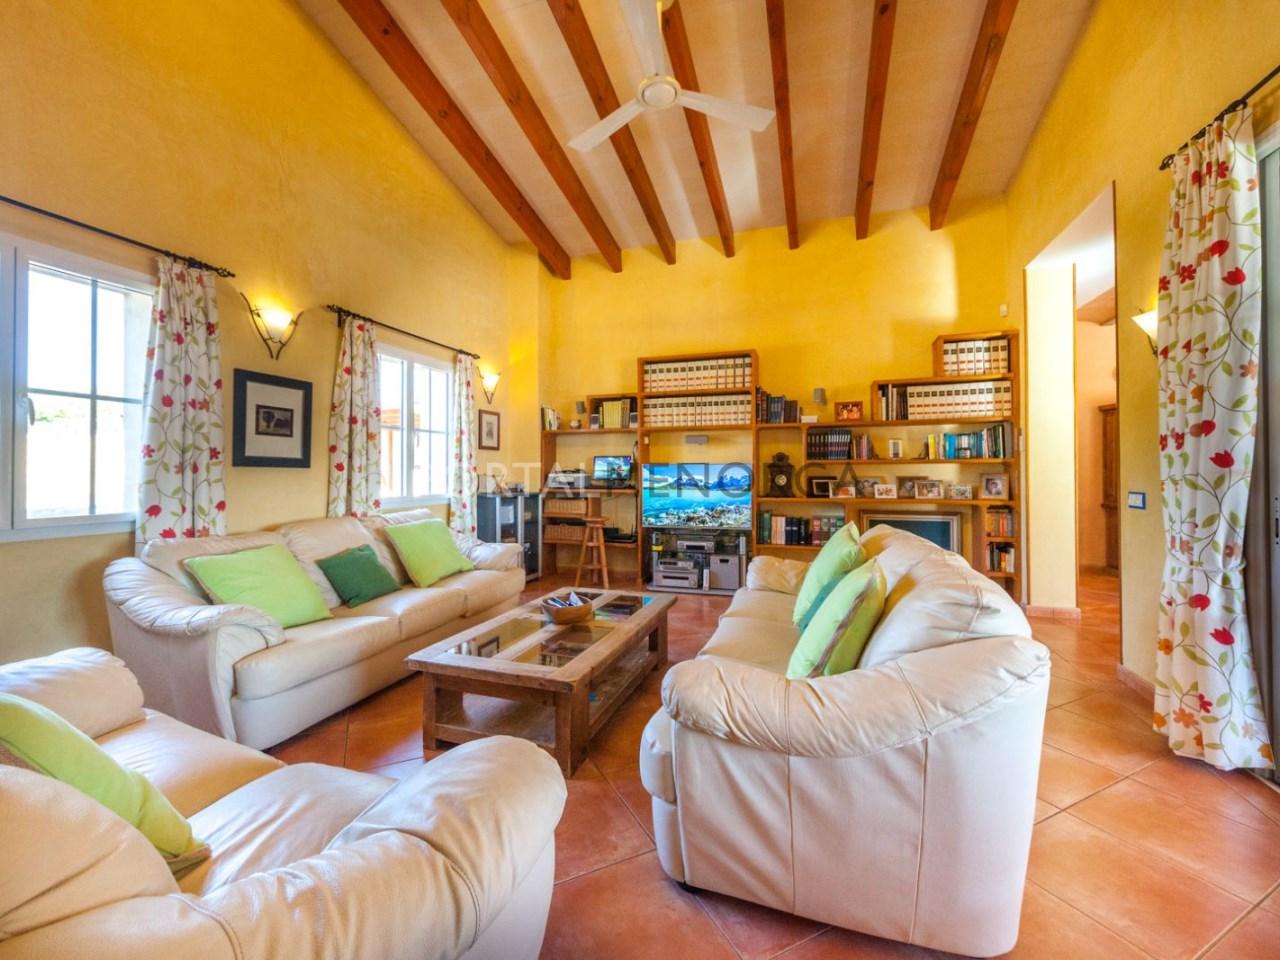 Casa de campo con piscina en Menorca (11 de 41)